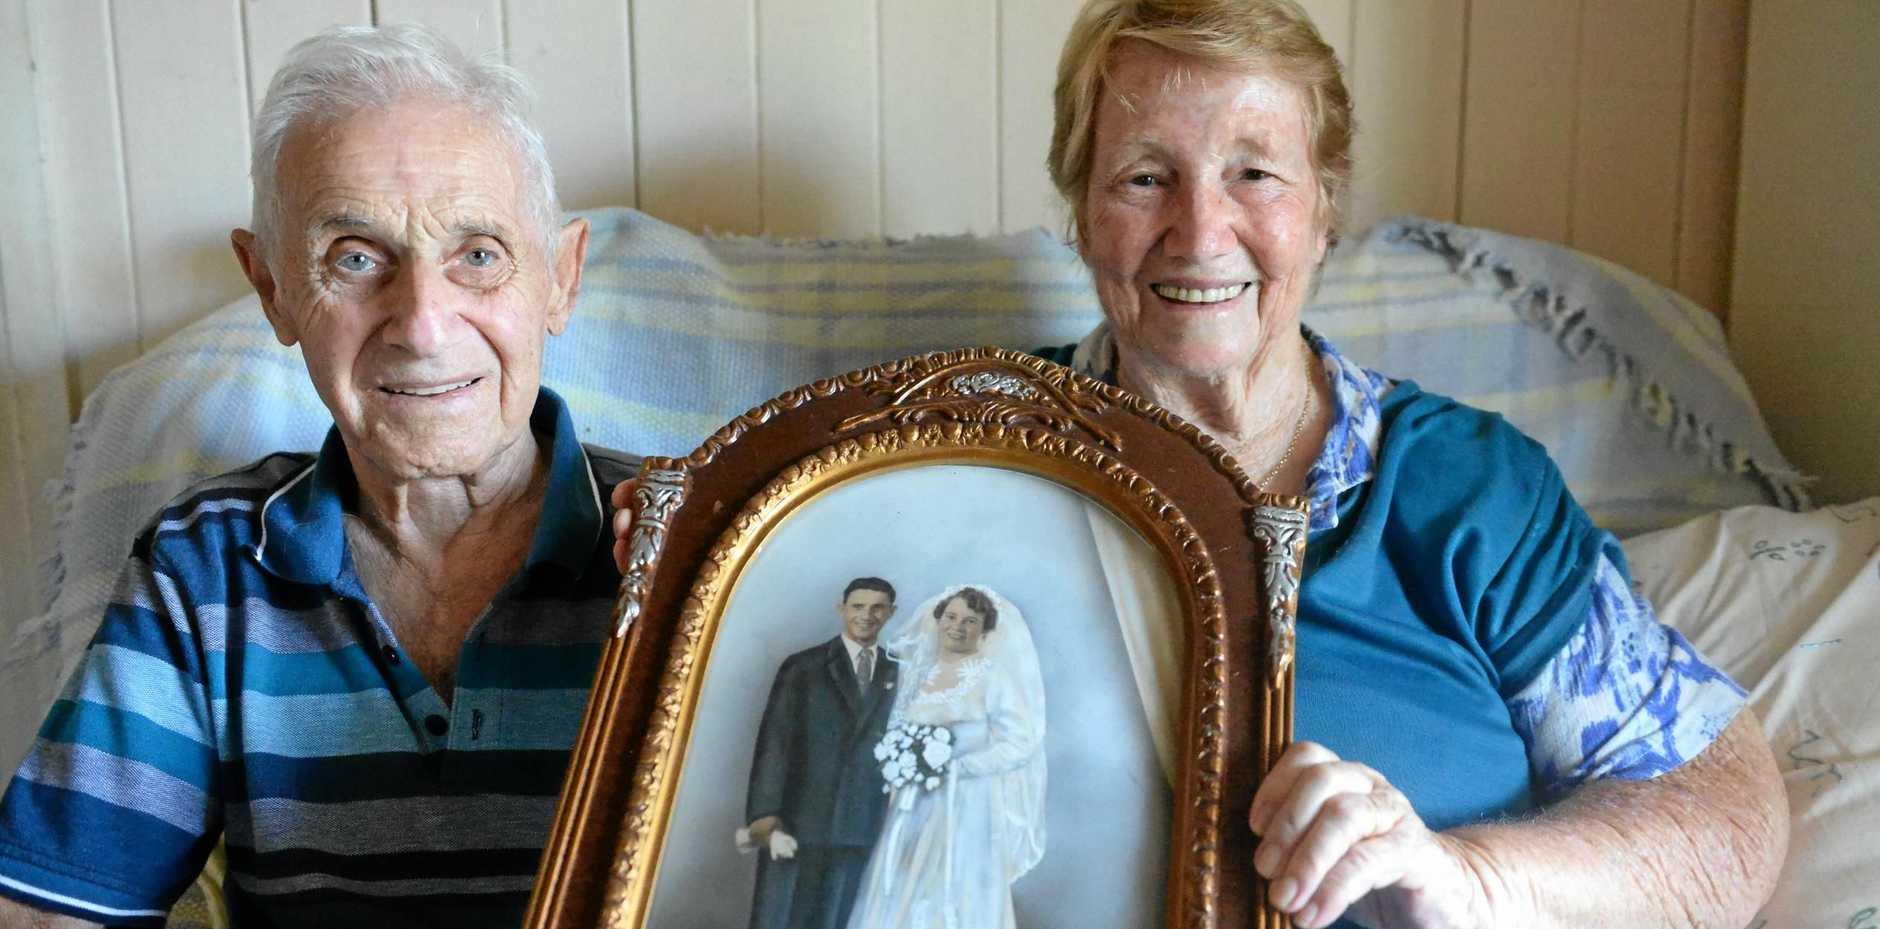 Settimio 'Sam' and Maisie Tortora are preparing to celebrate their 60th wedding anniversary.